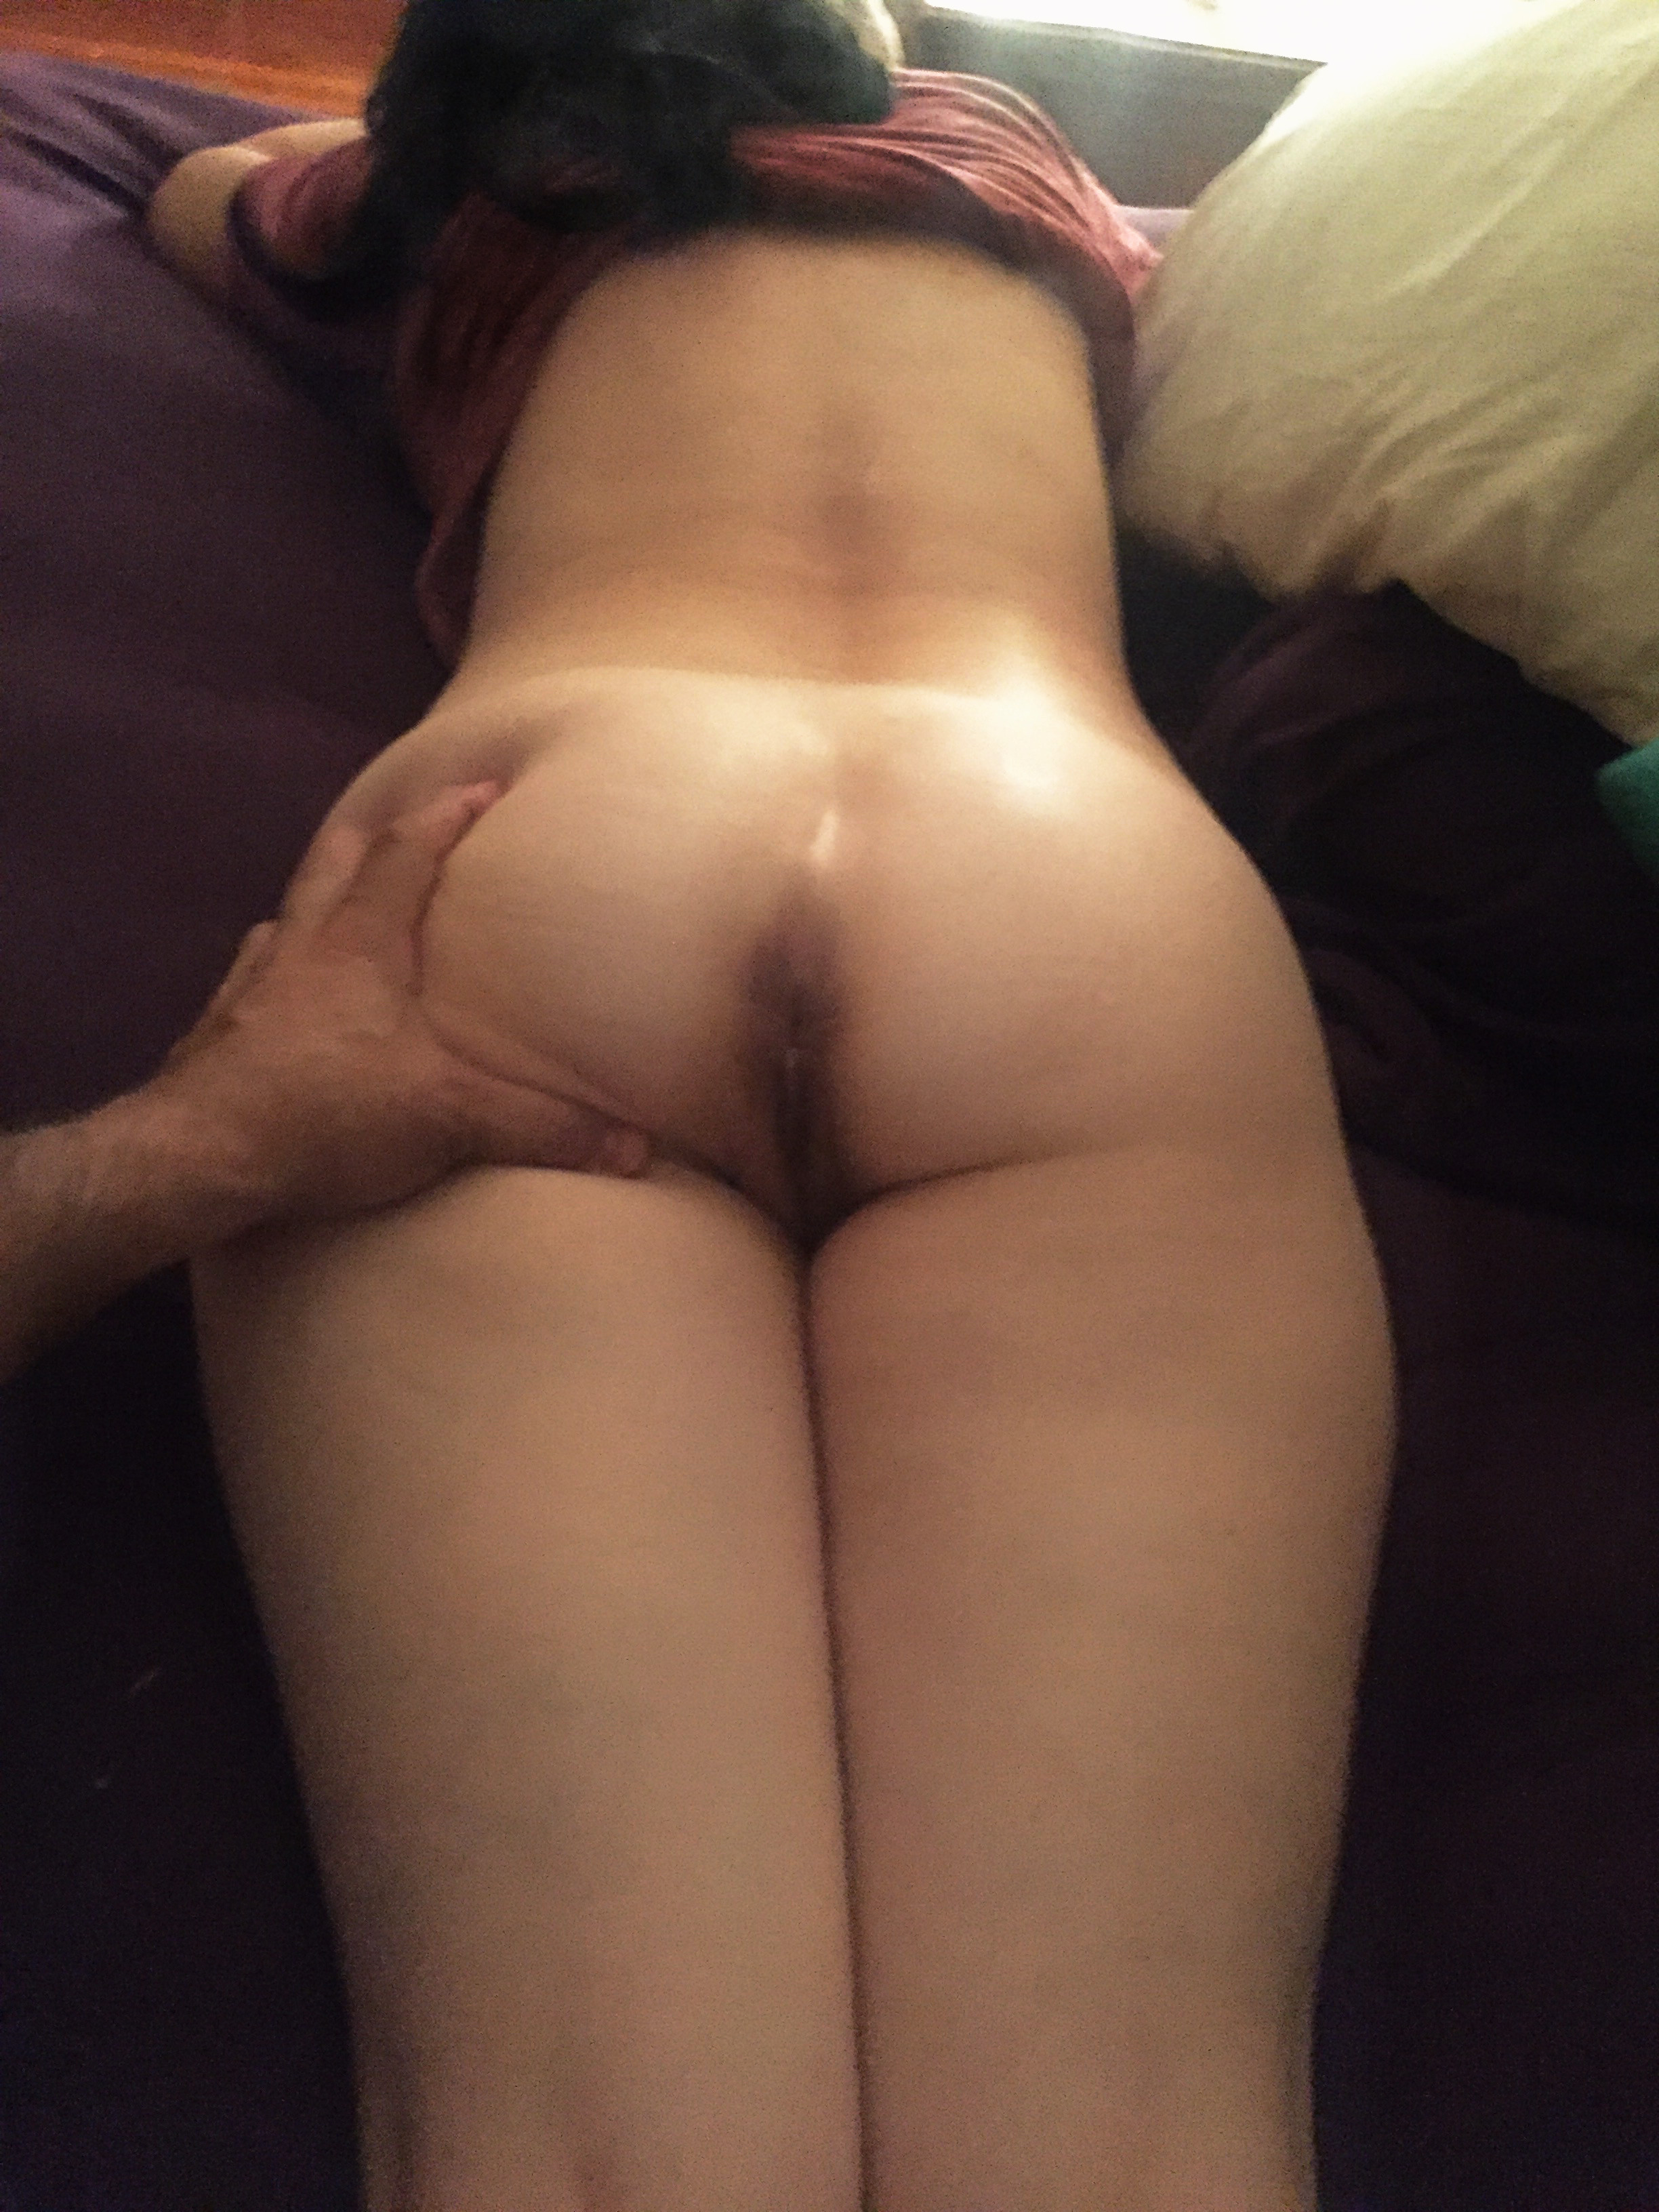 sister-ass-naked